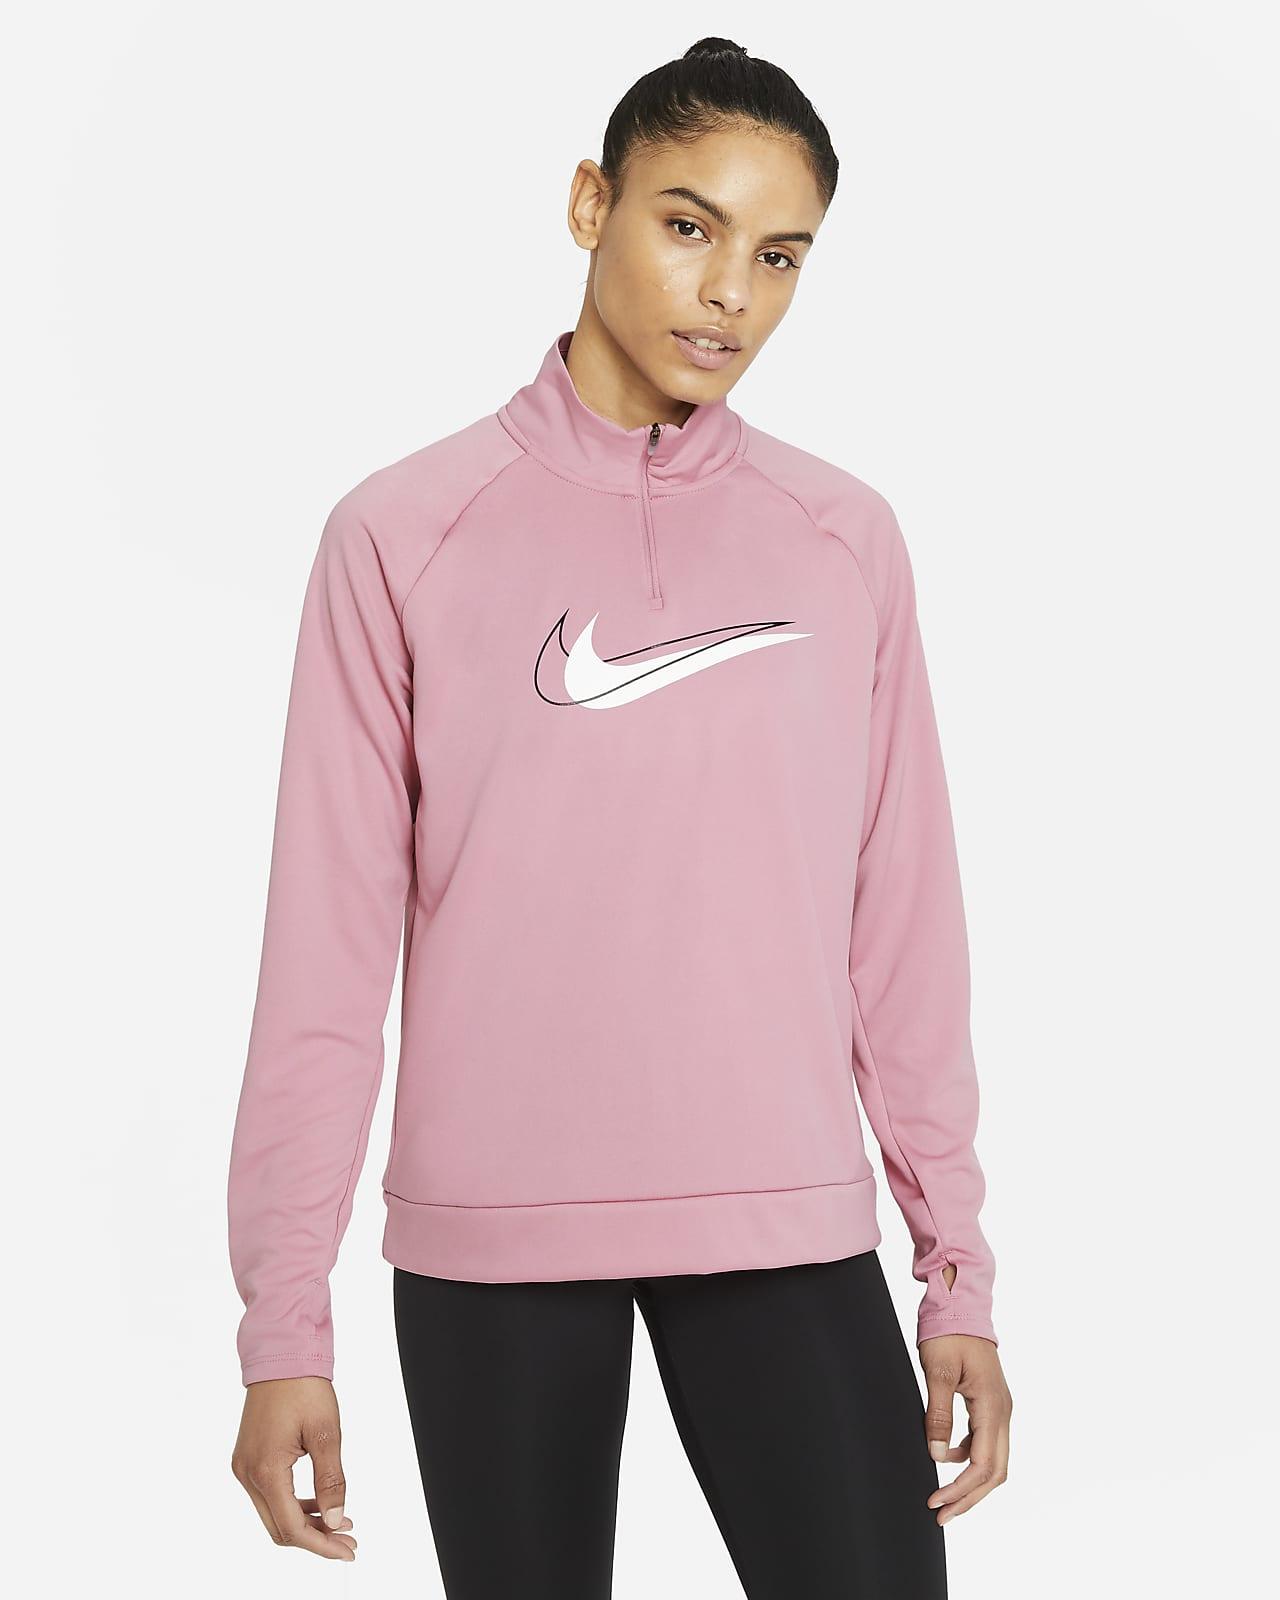 Capa media de running de medio cierre para mujer Nike Dri-FIT Swoosh Run